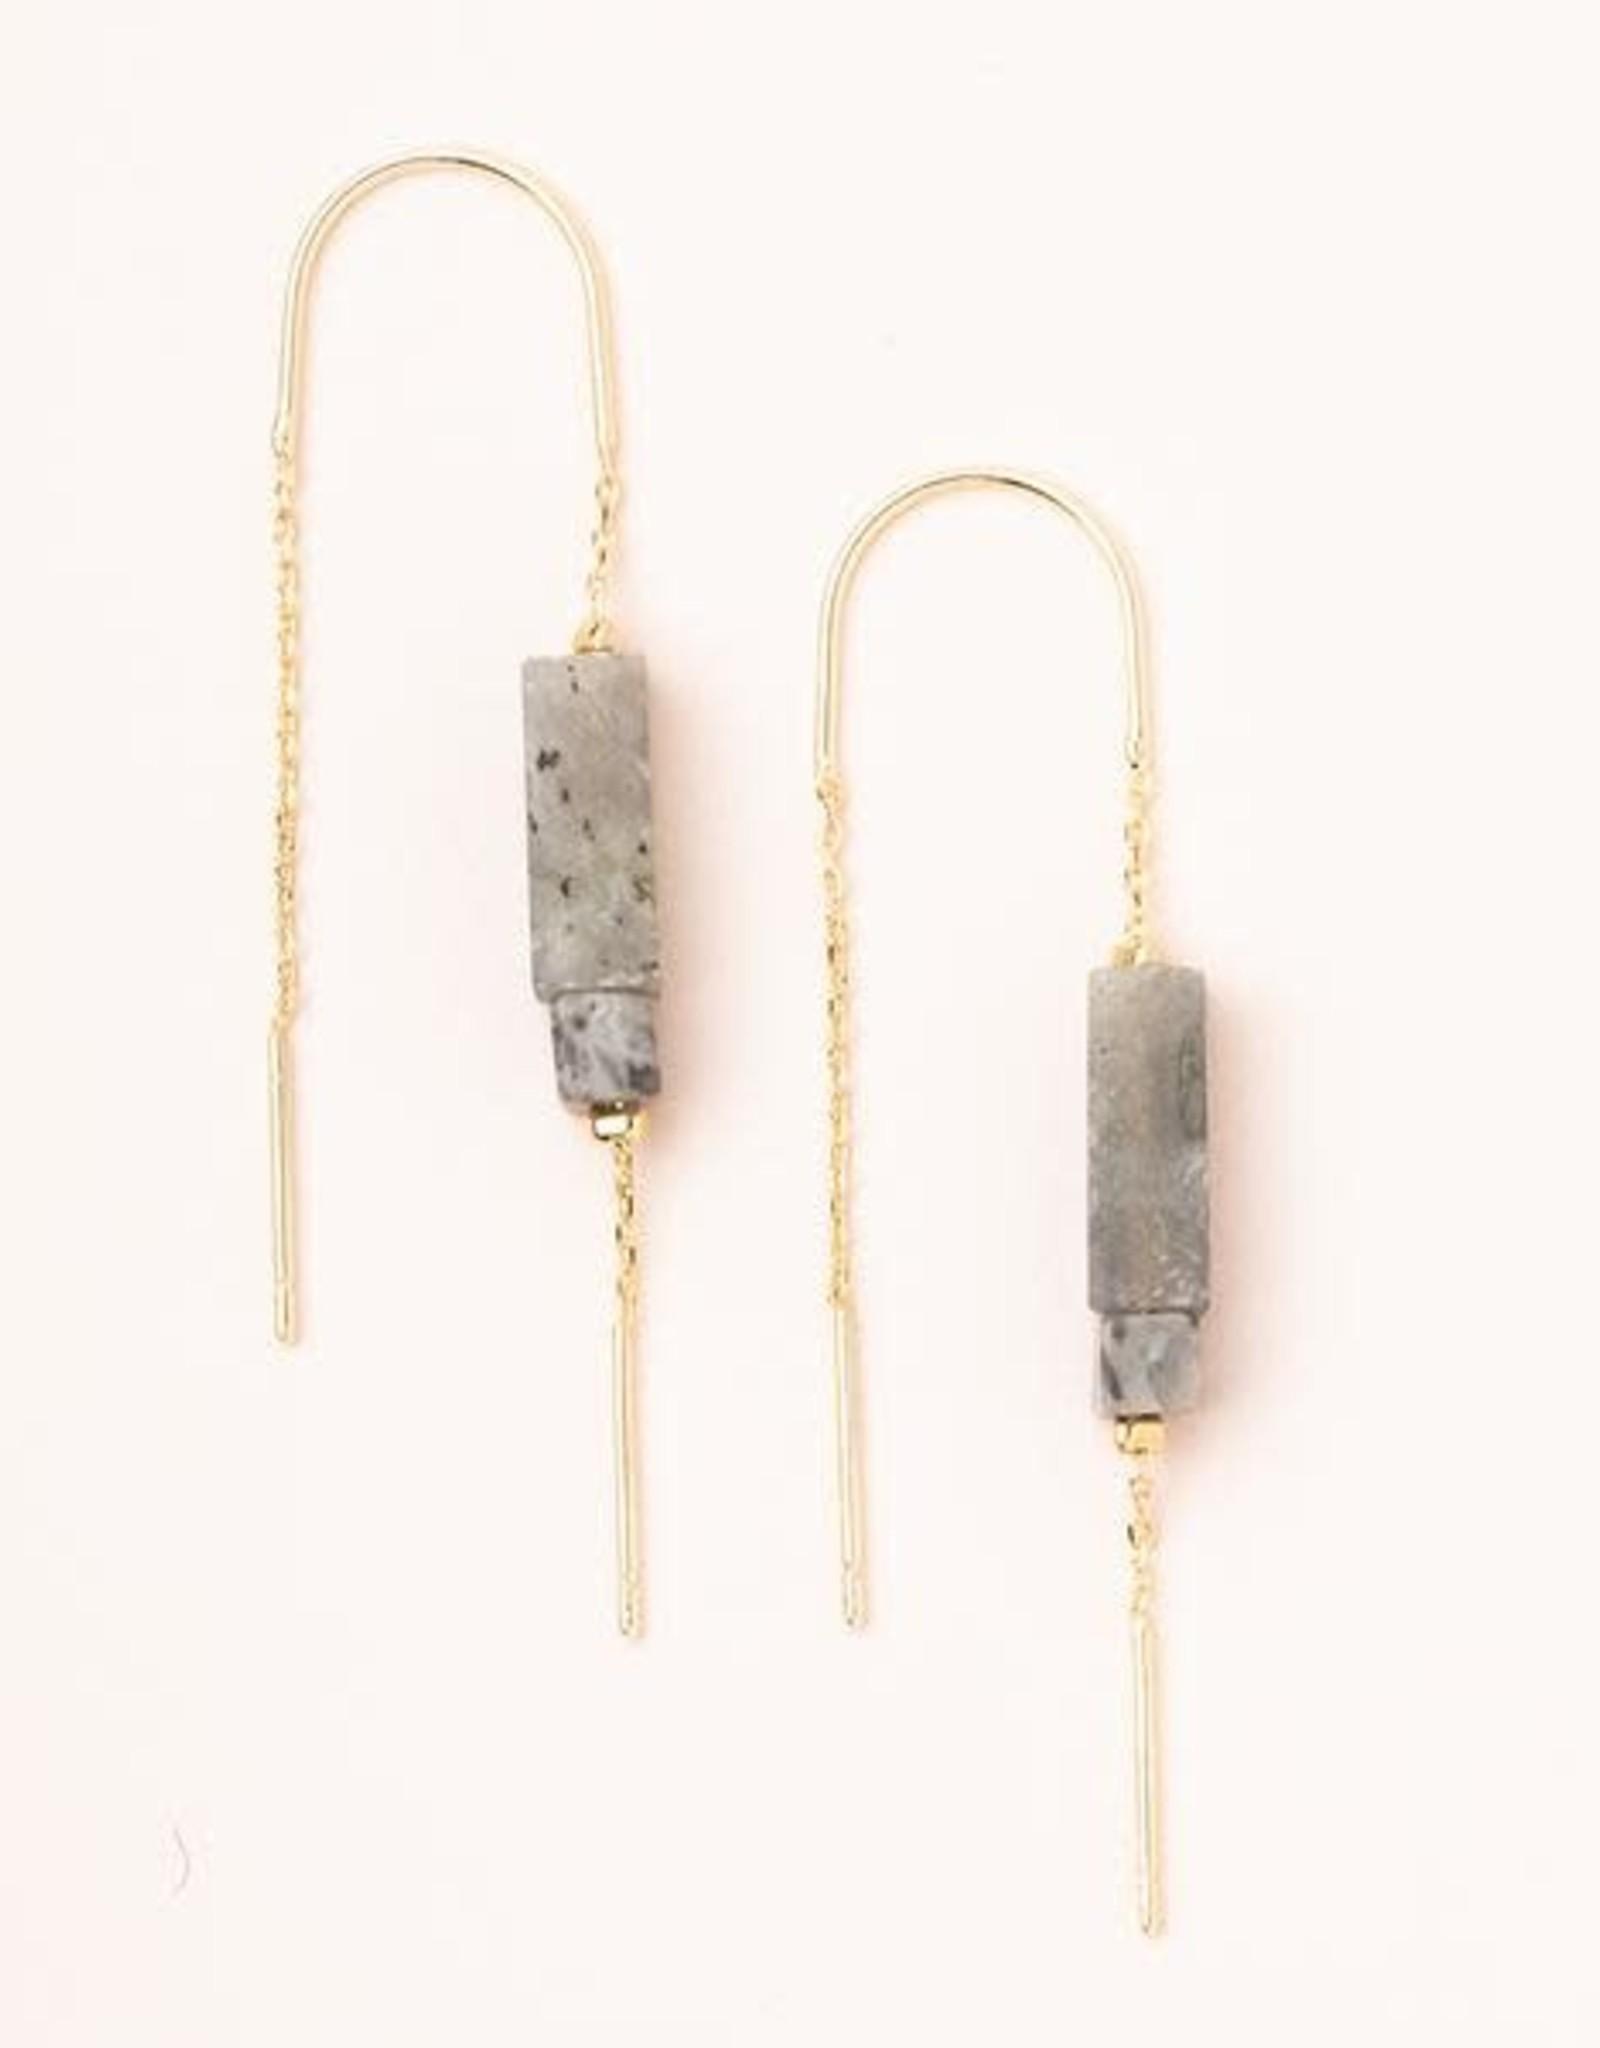 Scout Rect. Stone Earrings-Laboradorite